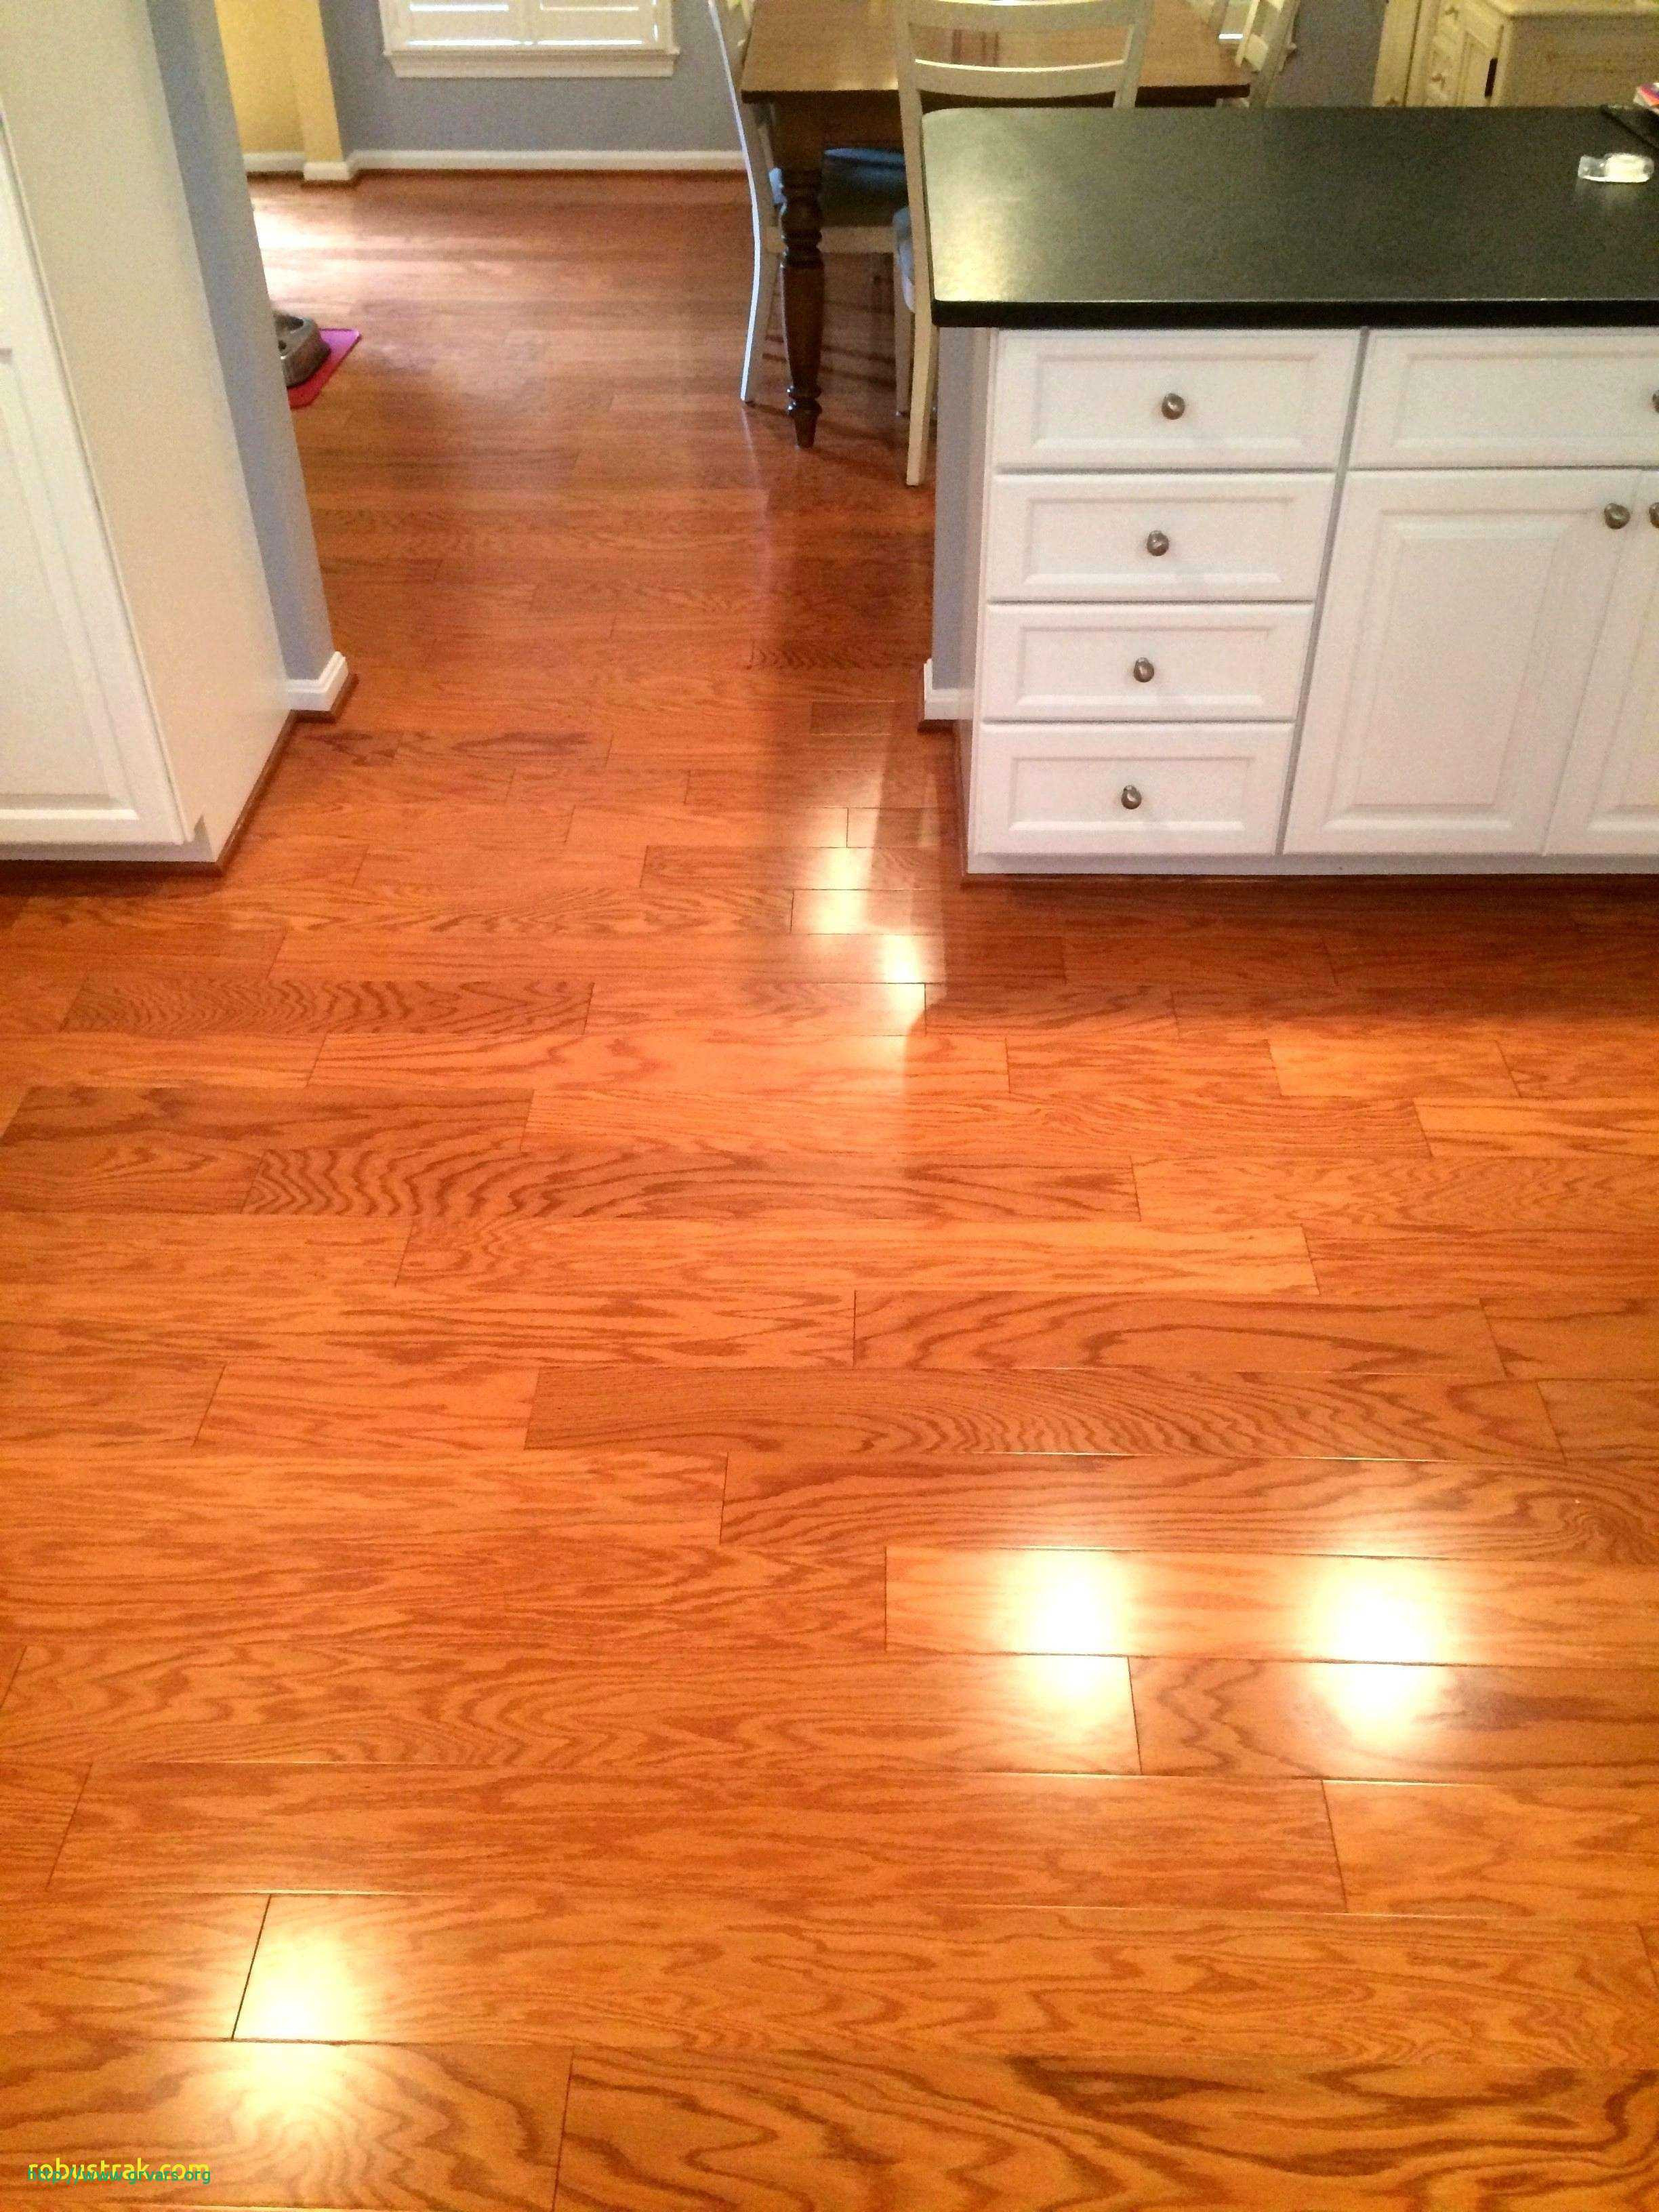 ash hardwood flooring of 25 beau fore wood floors ideas blog intended for hardwood floors in the kitchen fresh where to buy hardwood flooring inspirational 0d grace place barnegat